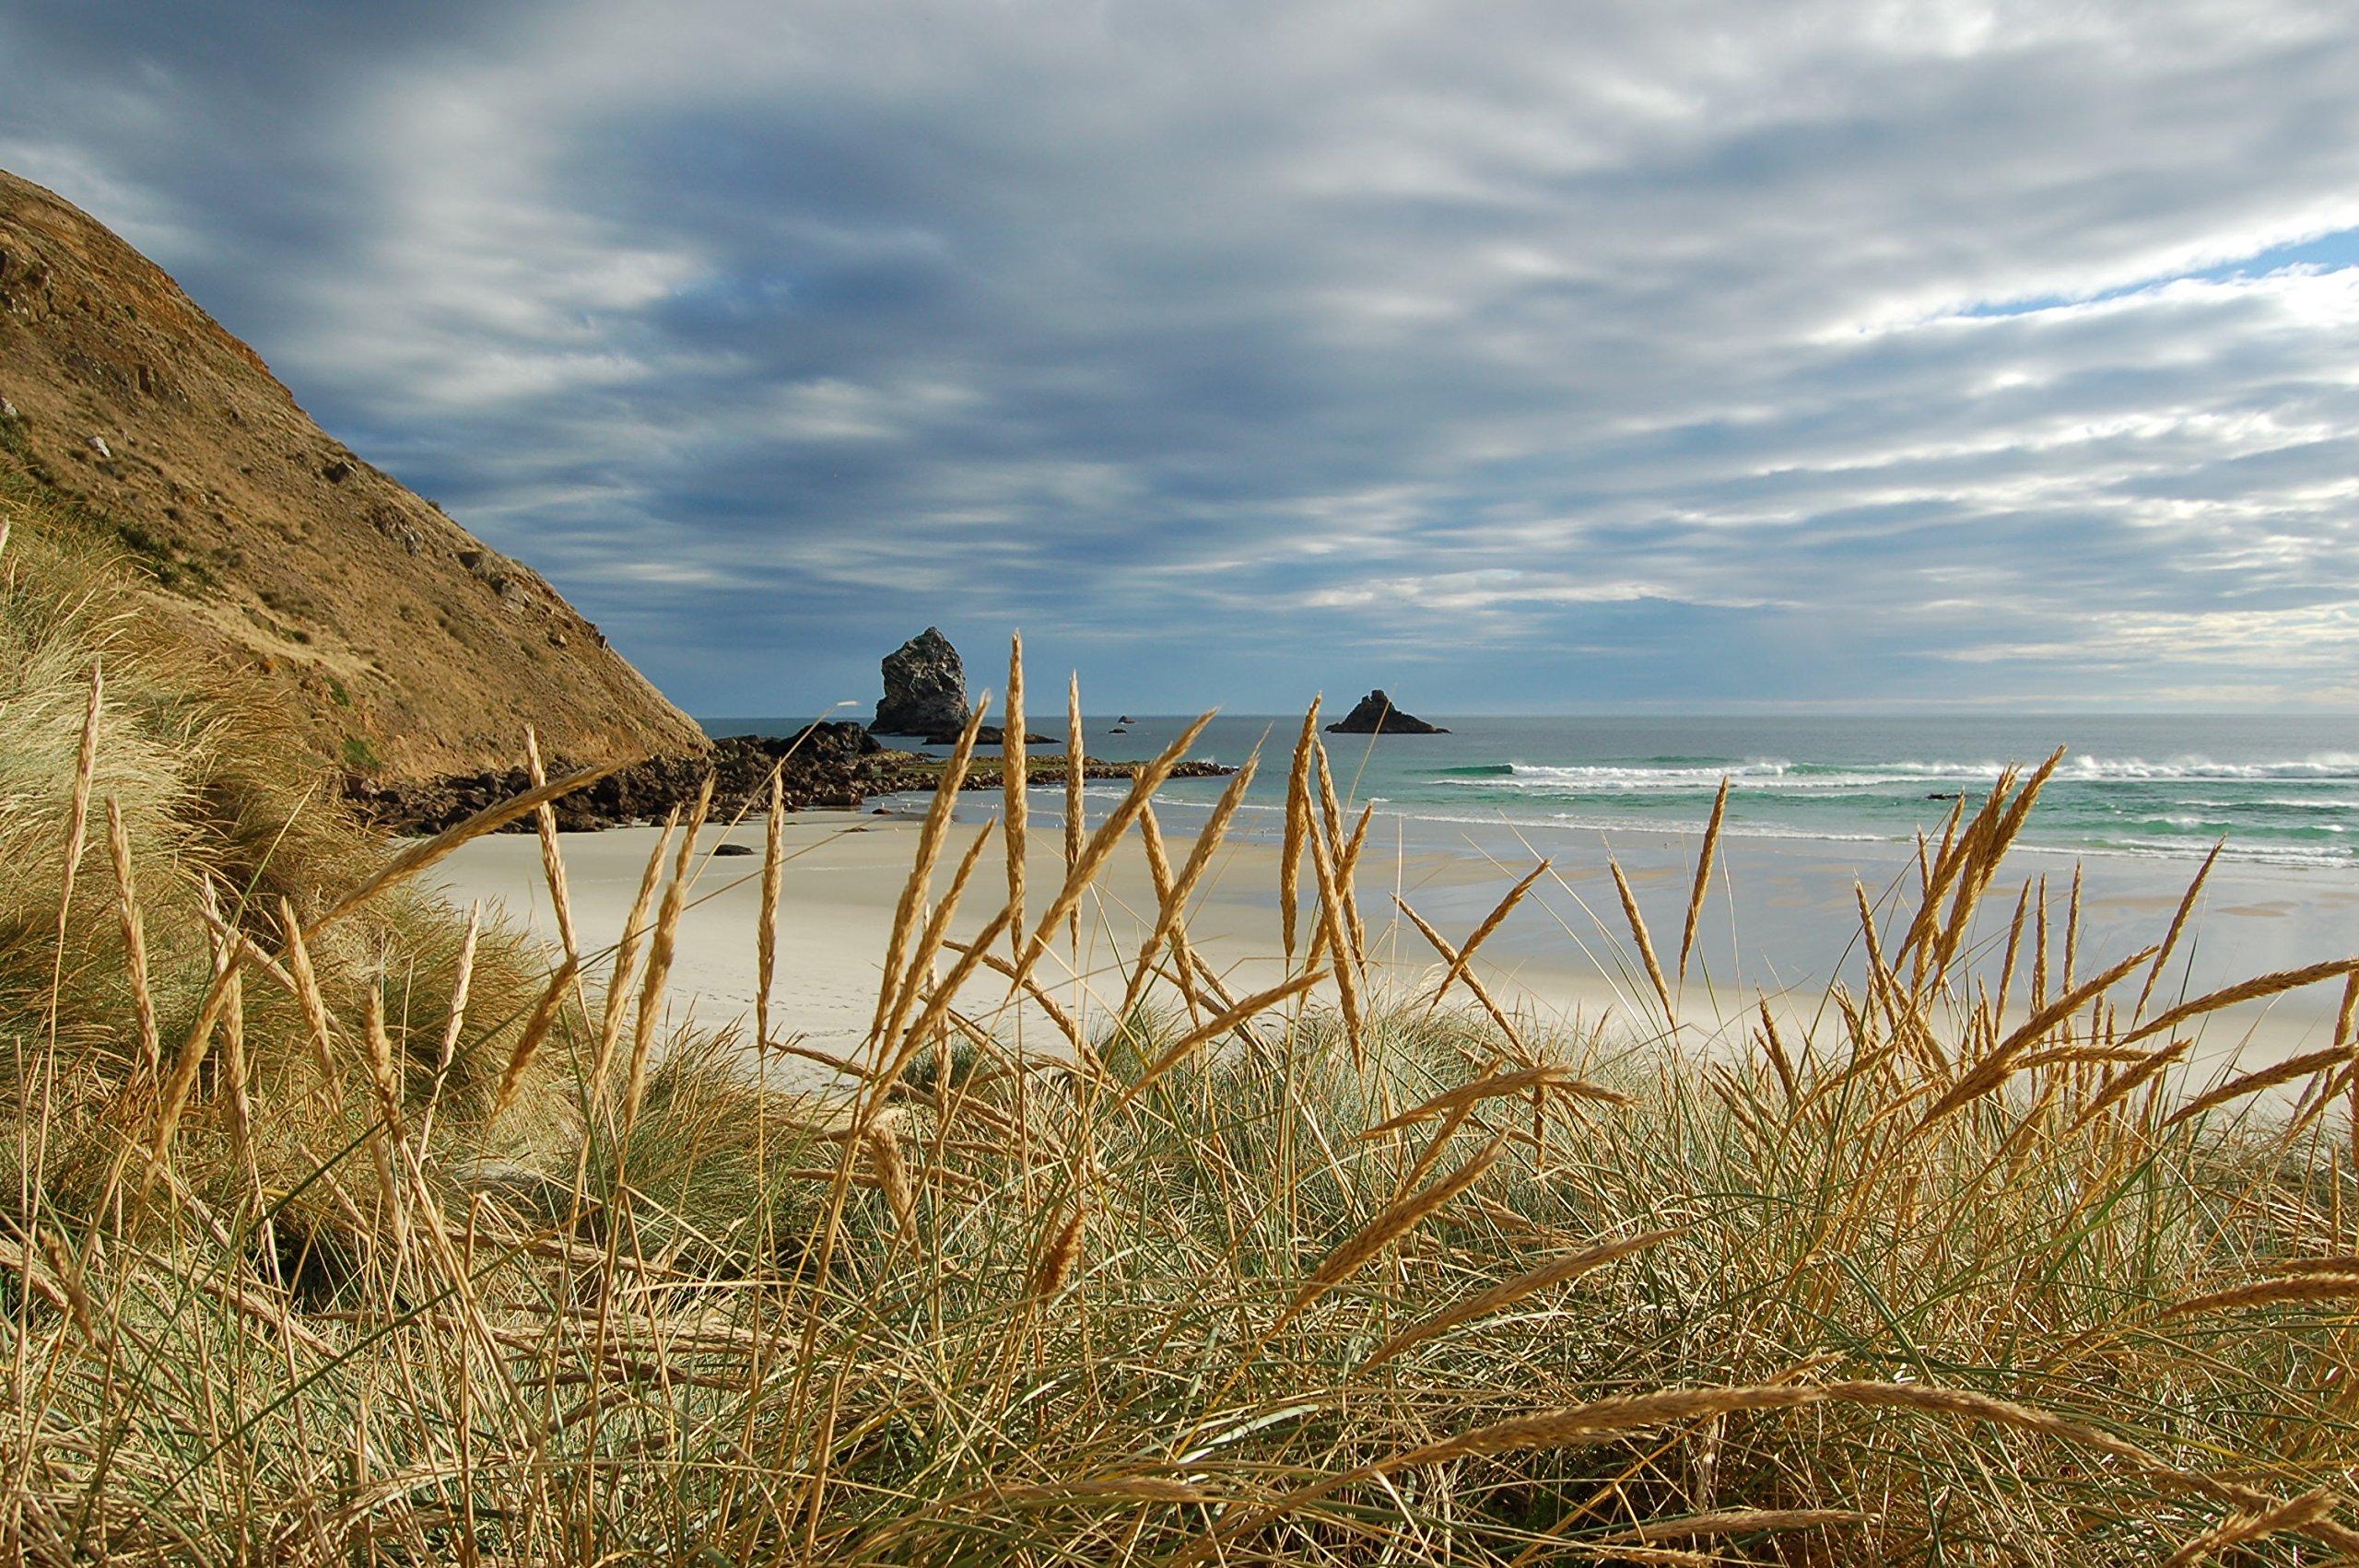 Coastal Beach Scene